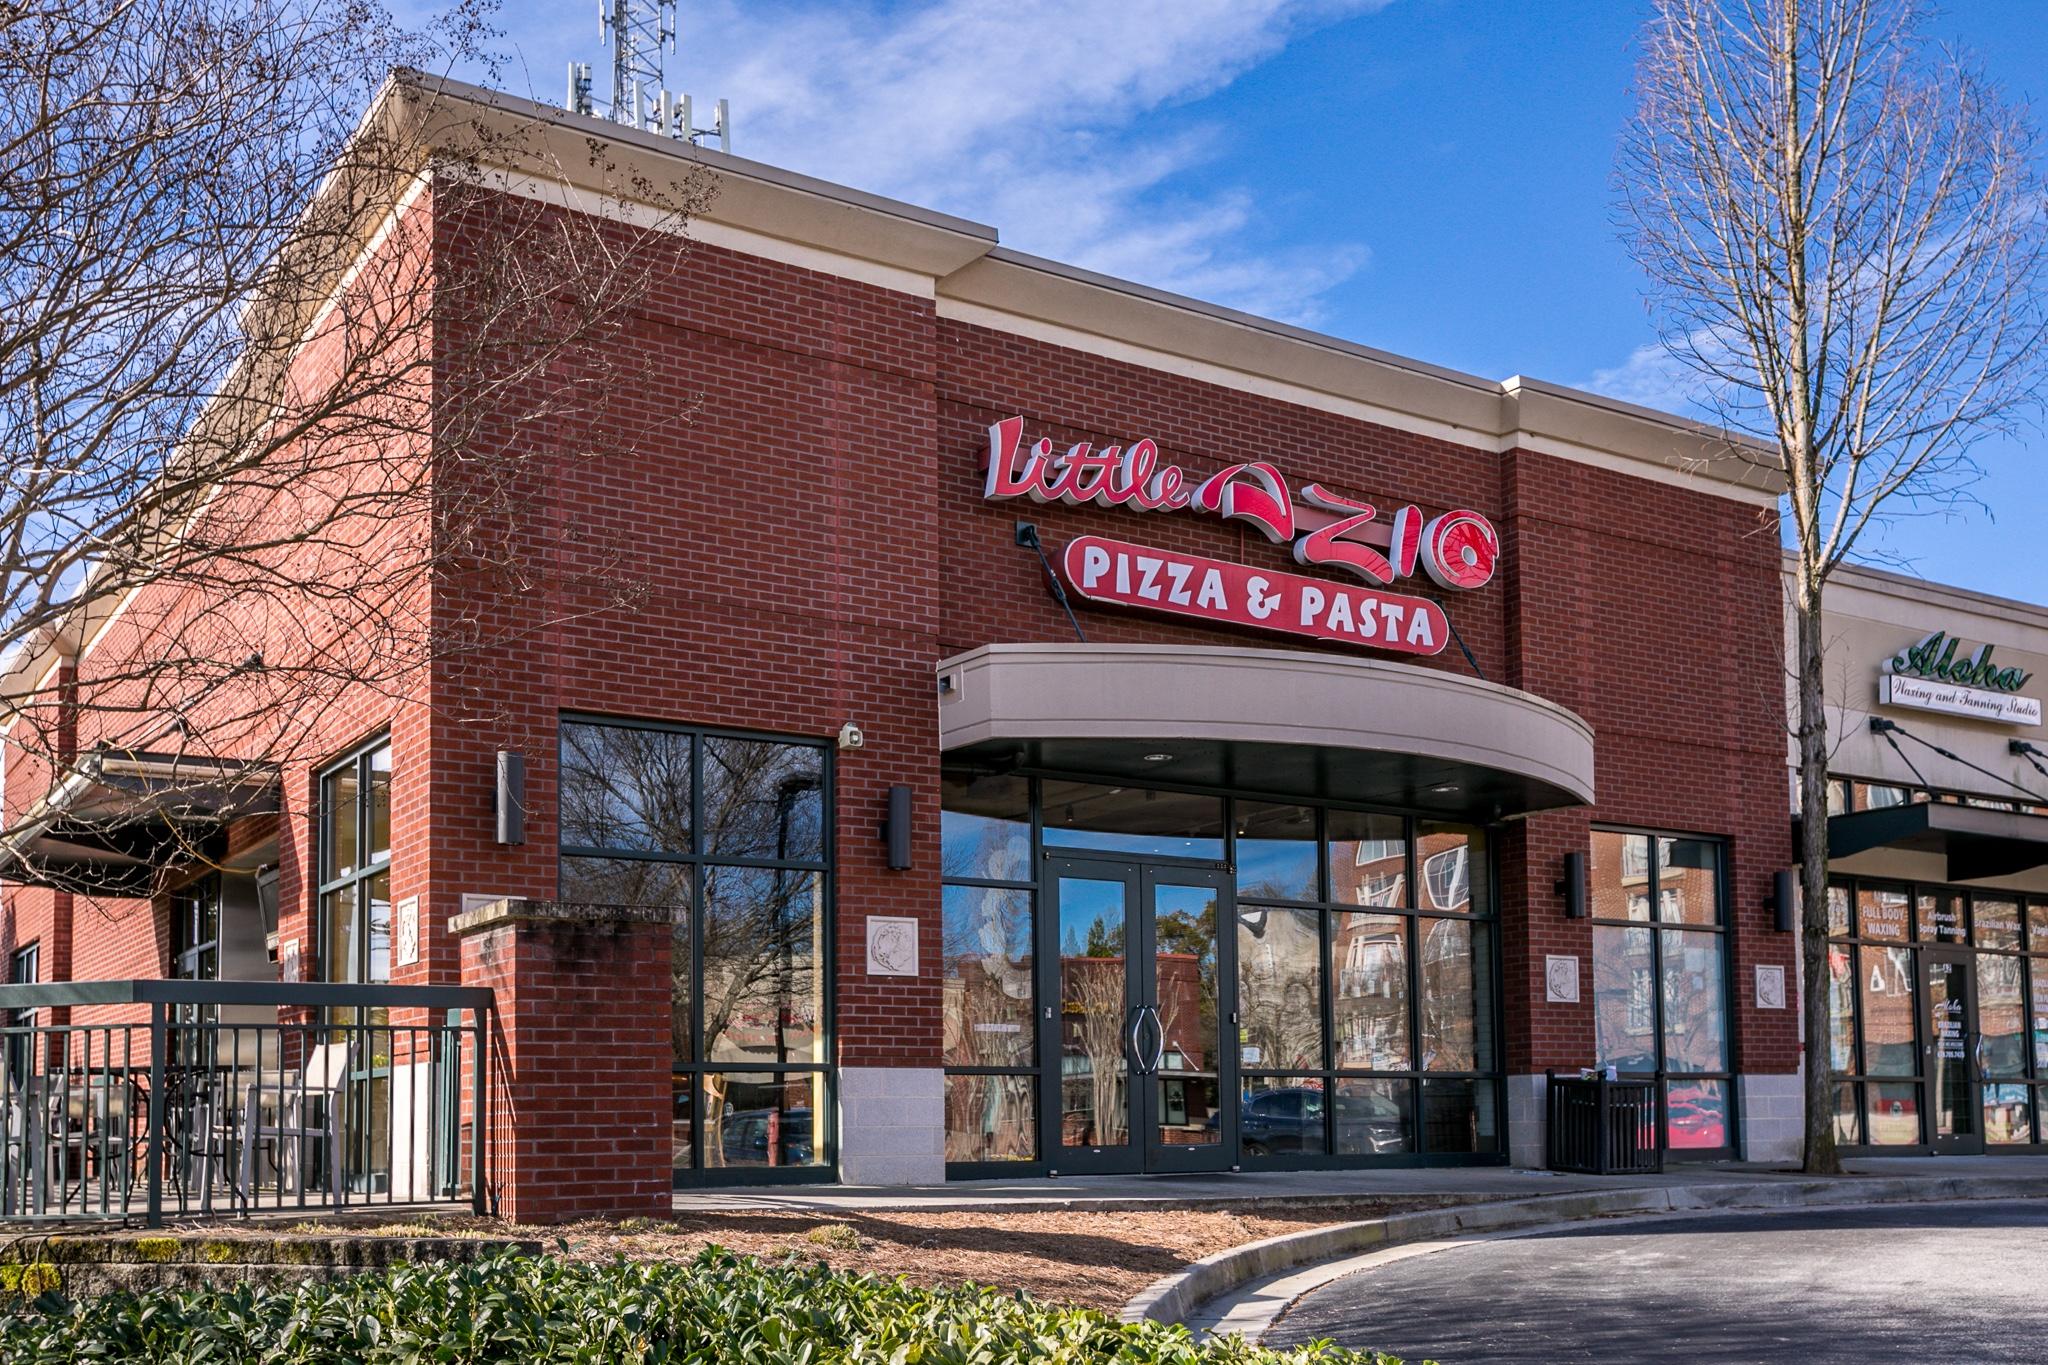 1700 Northside Drive Atlanta, GA 30318-12.jpg